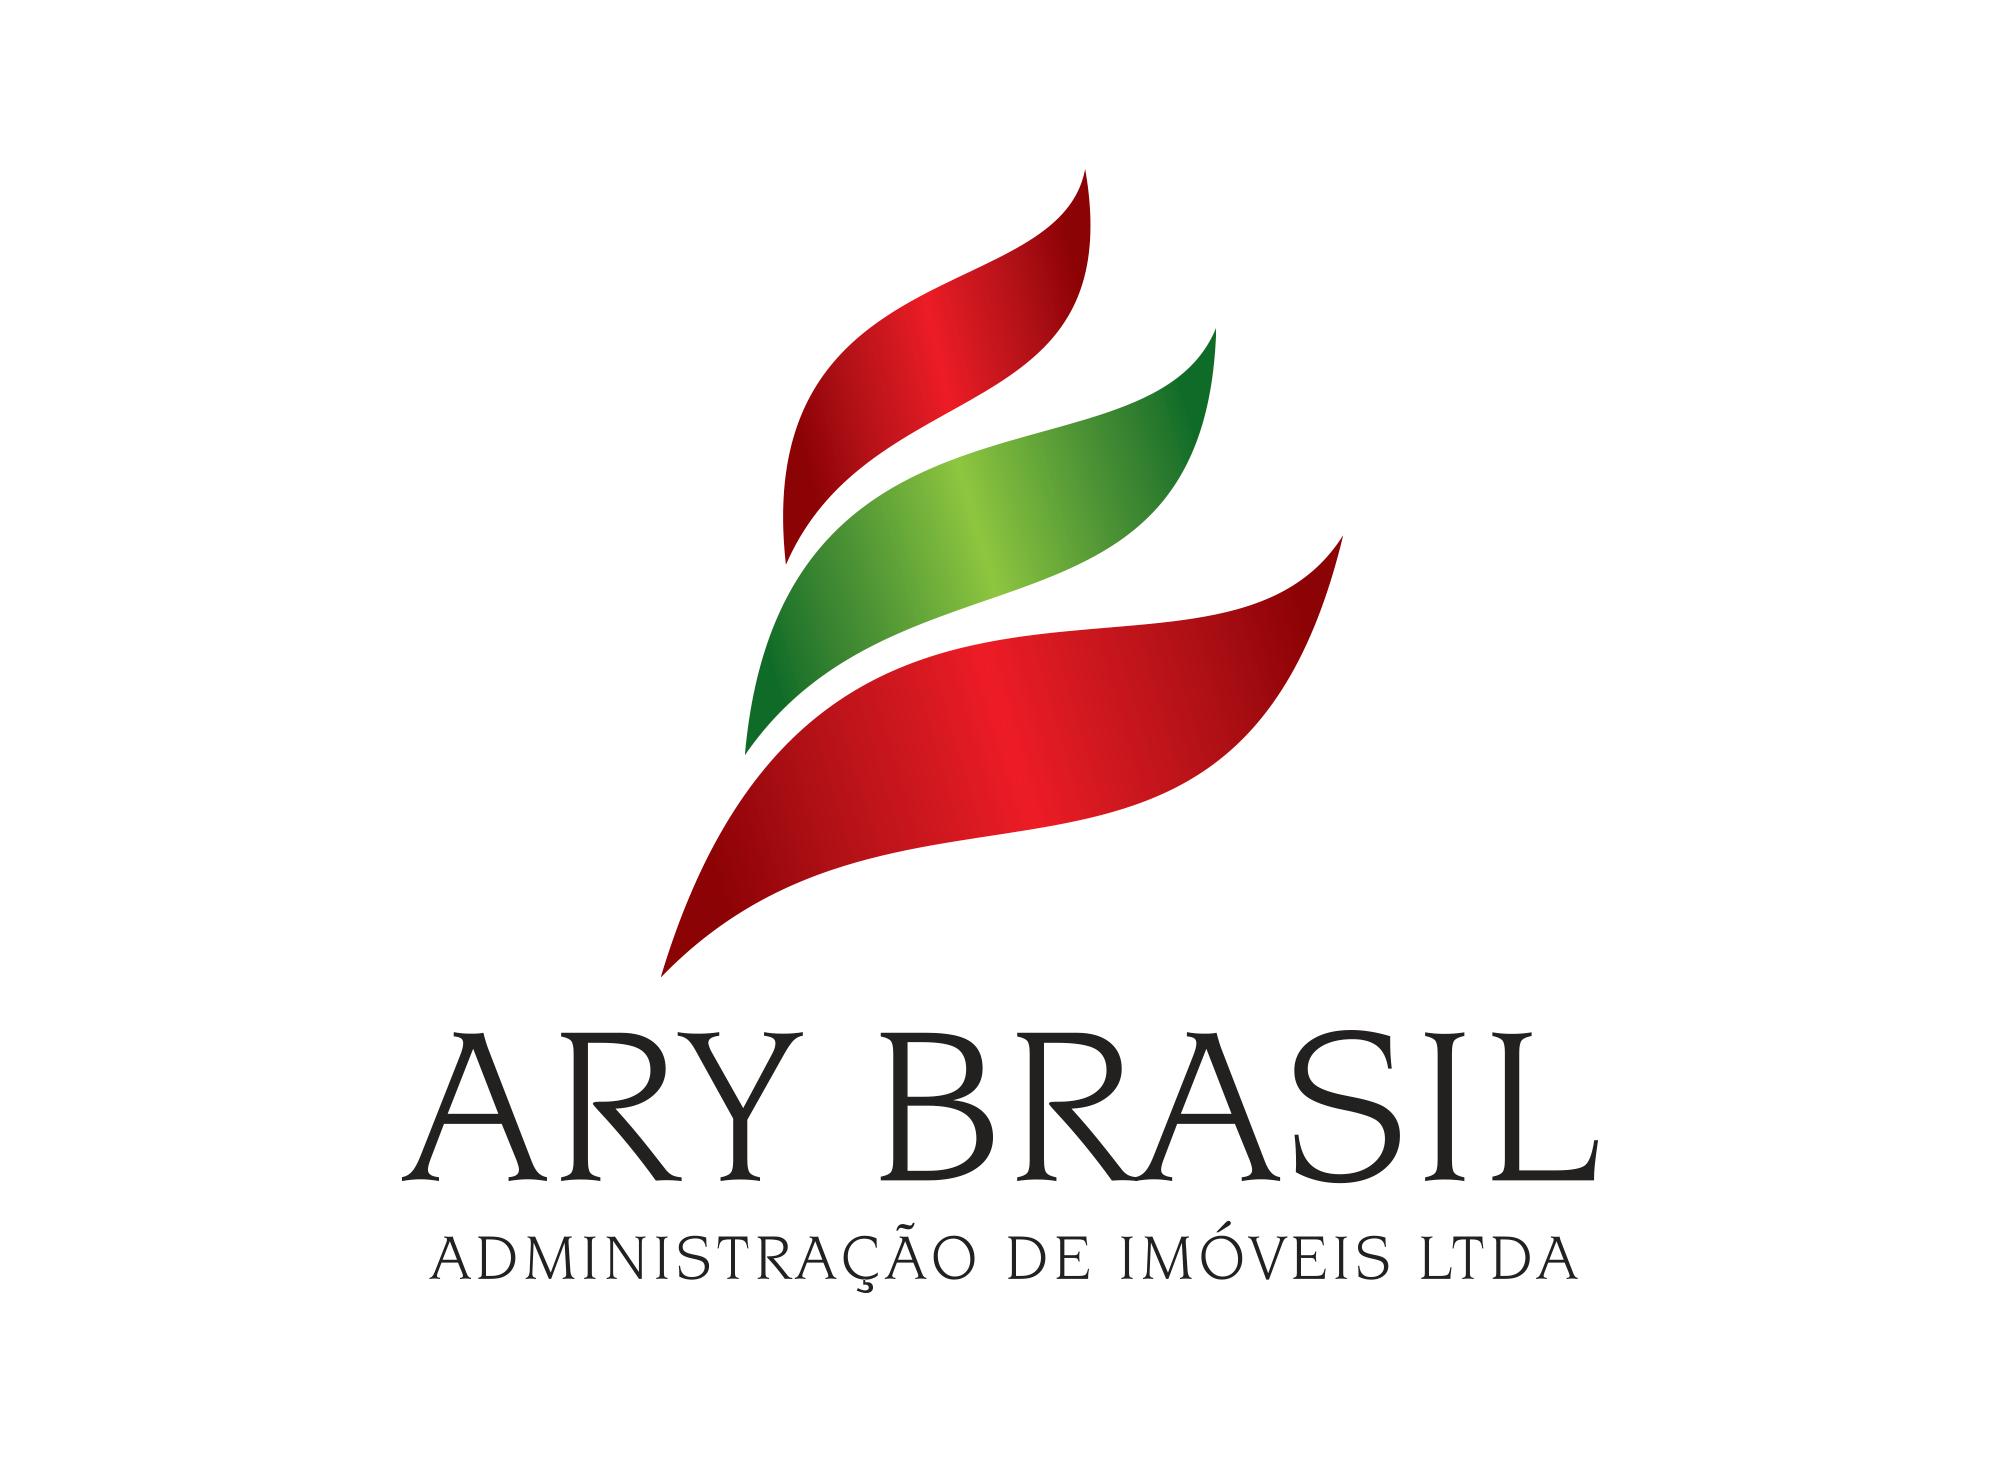 ary-brasil-administracao-imoveis-clientes-agencia-diretriz-digital-marketing-fortaleza